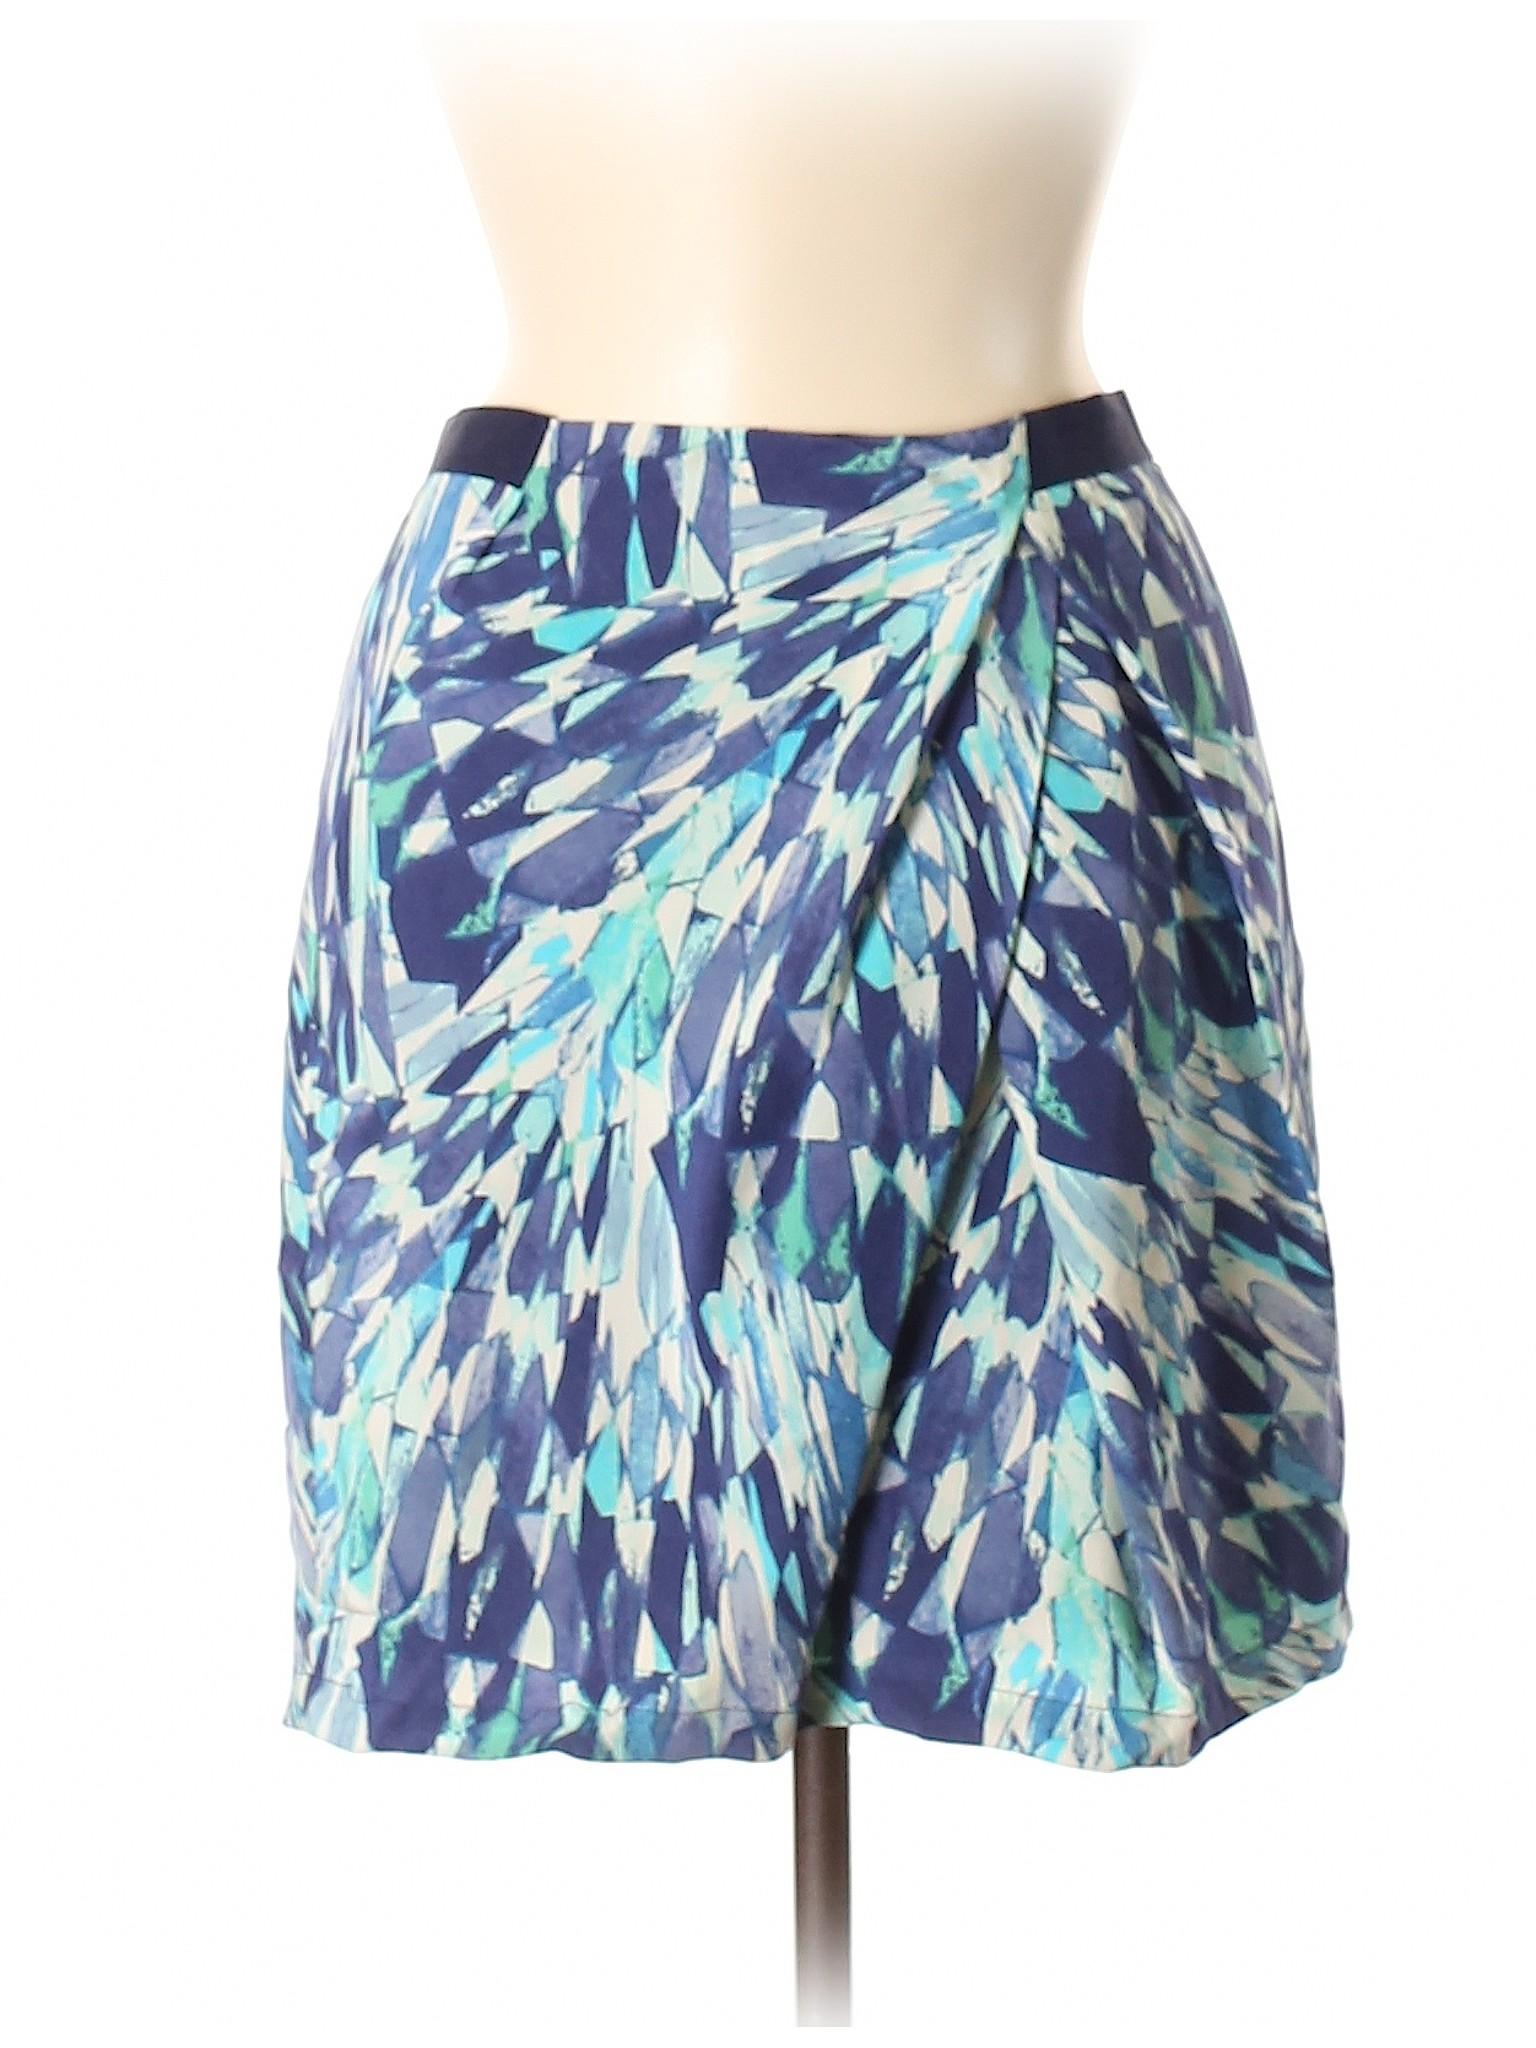 Silk Silk Skirt Skirt Boutique Boutique 7anwgqxf5S